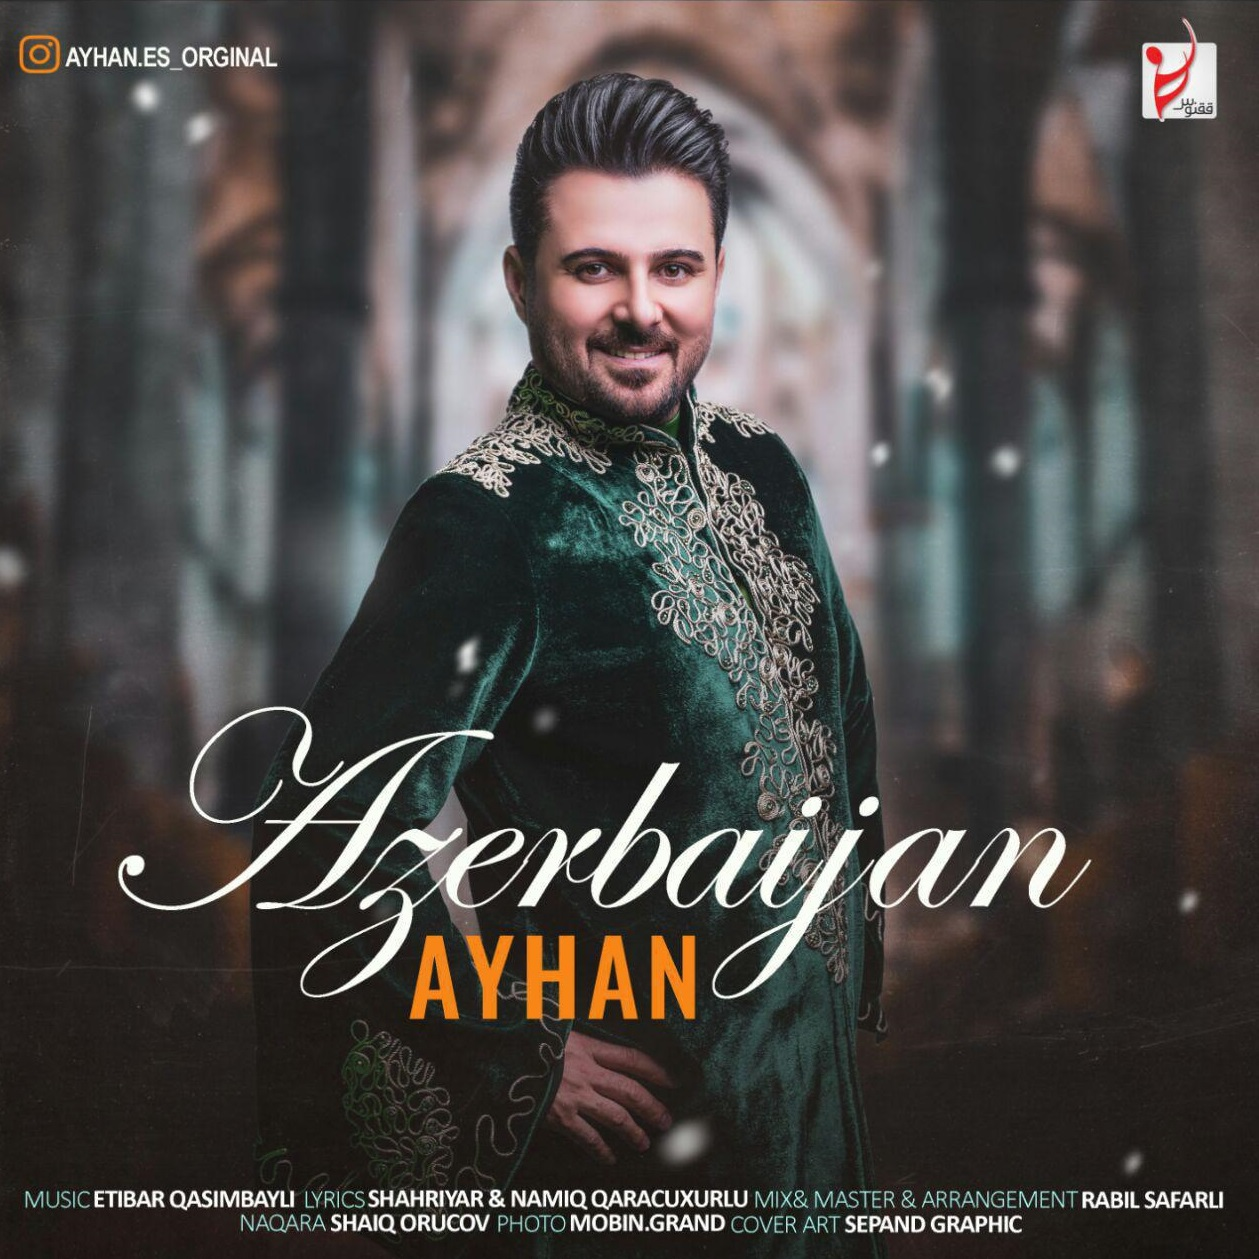 http://s6.picofile.com/file/8382472934/01Ayhan_Azerbaijan.jpg